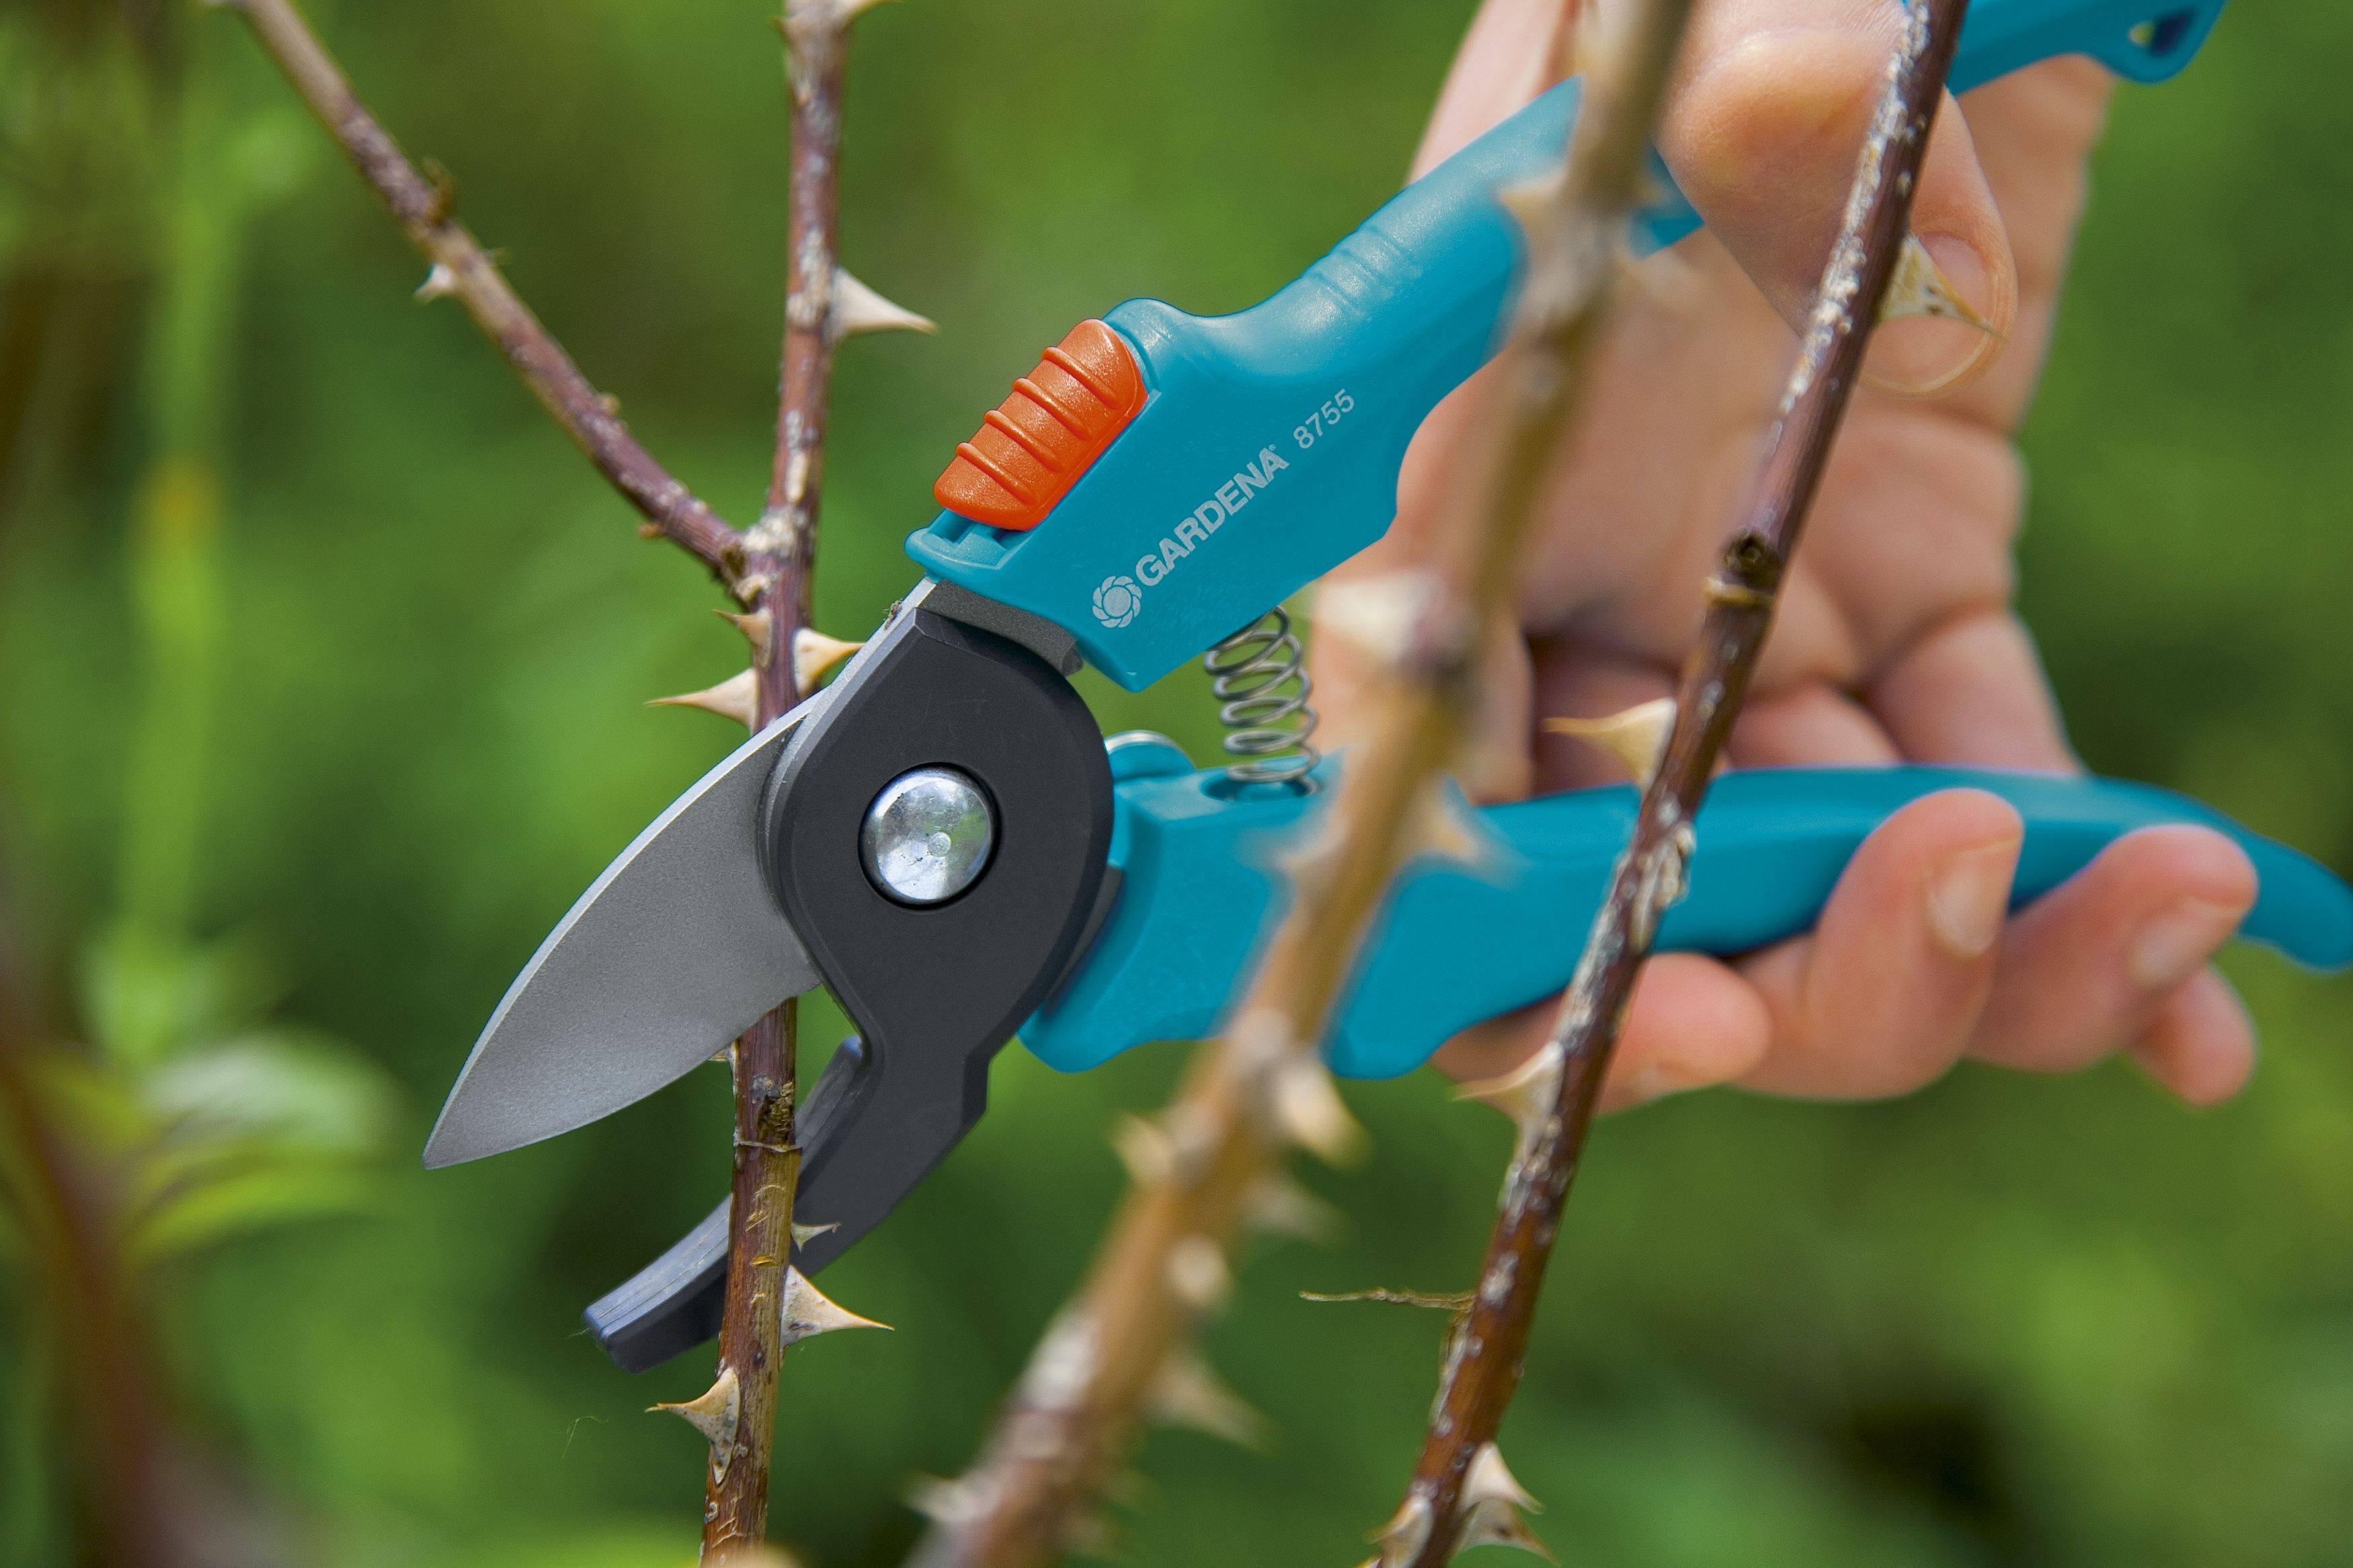 Сучкорезы для обрезки деревьев